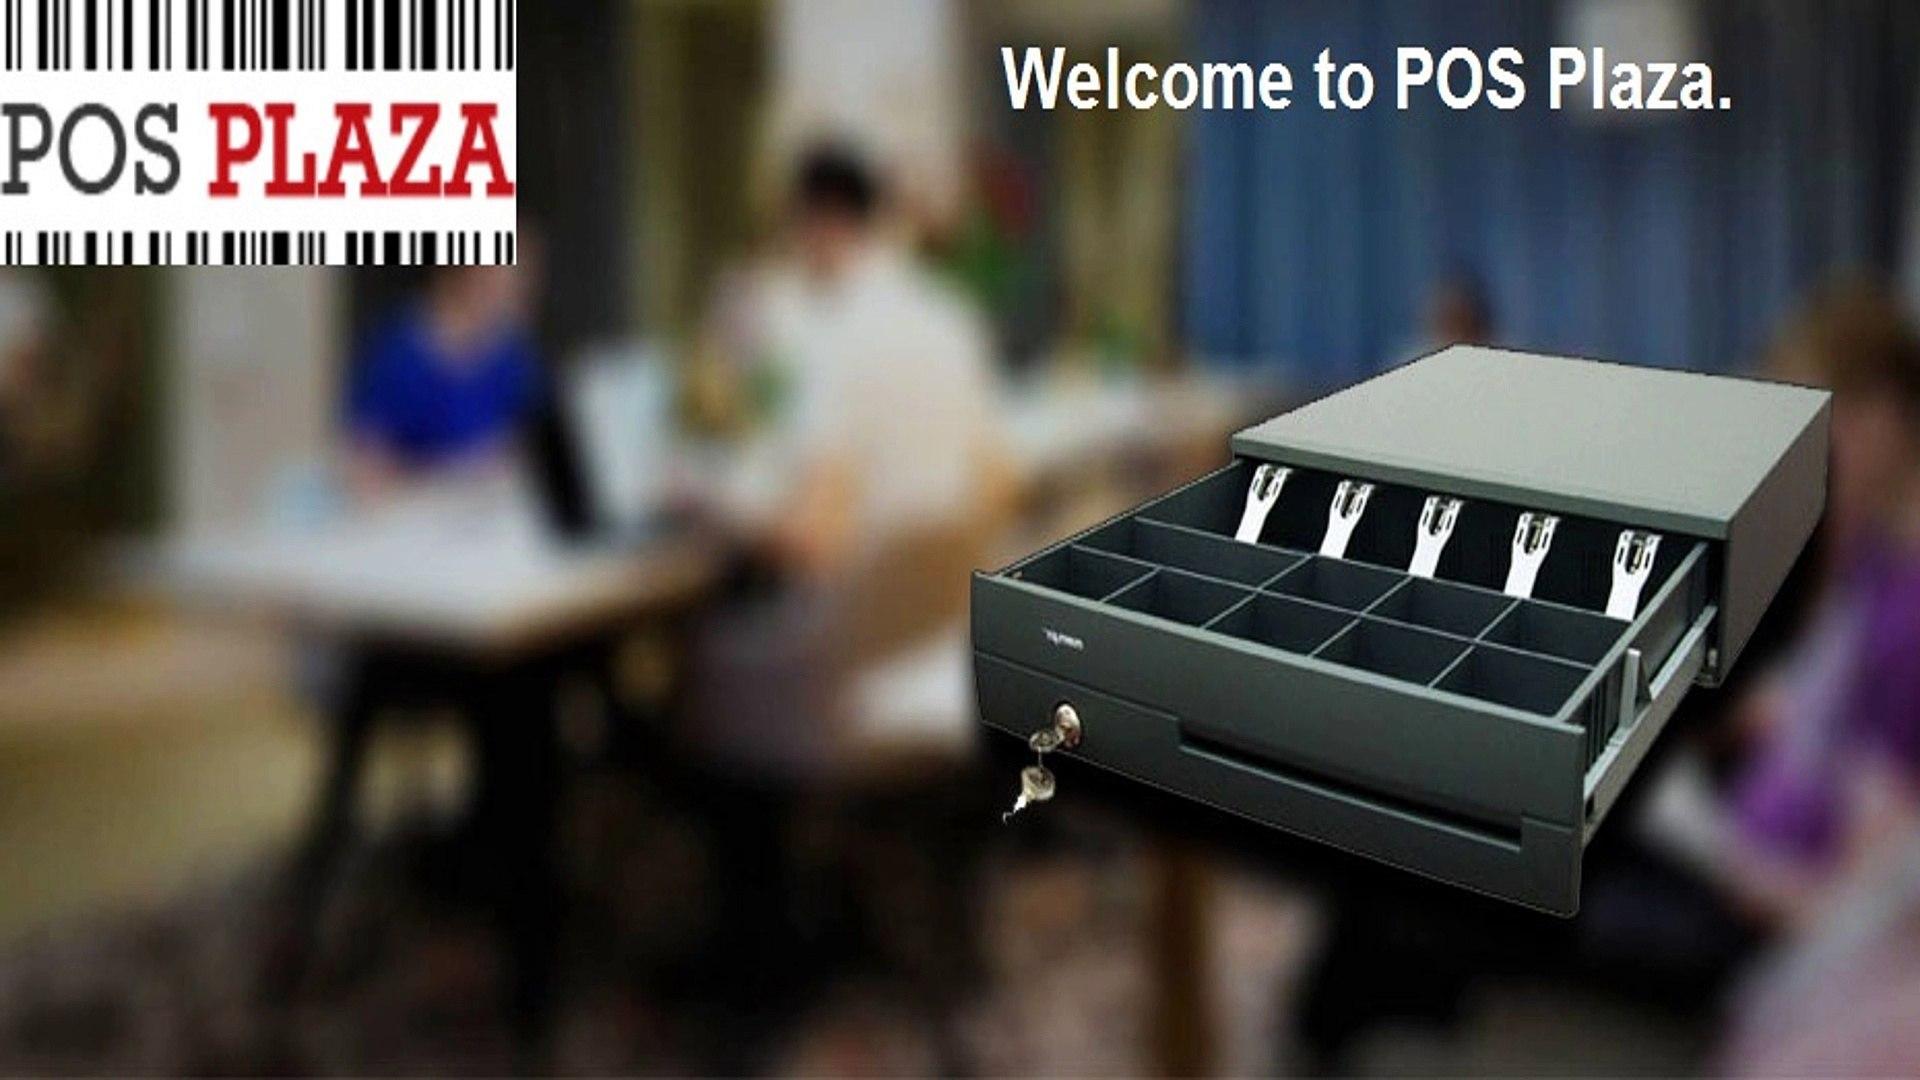 Vend Compatible Hardware - posplaza.com.au